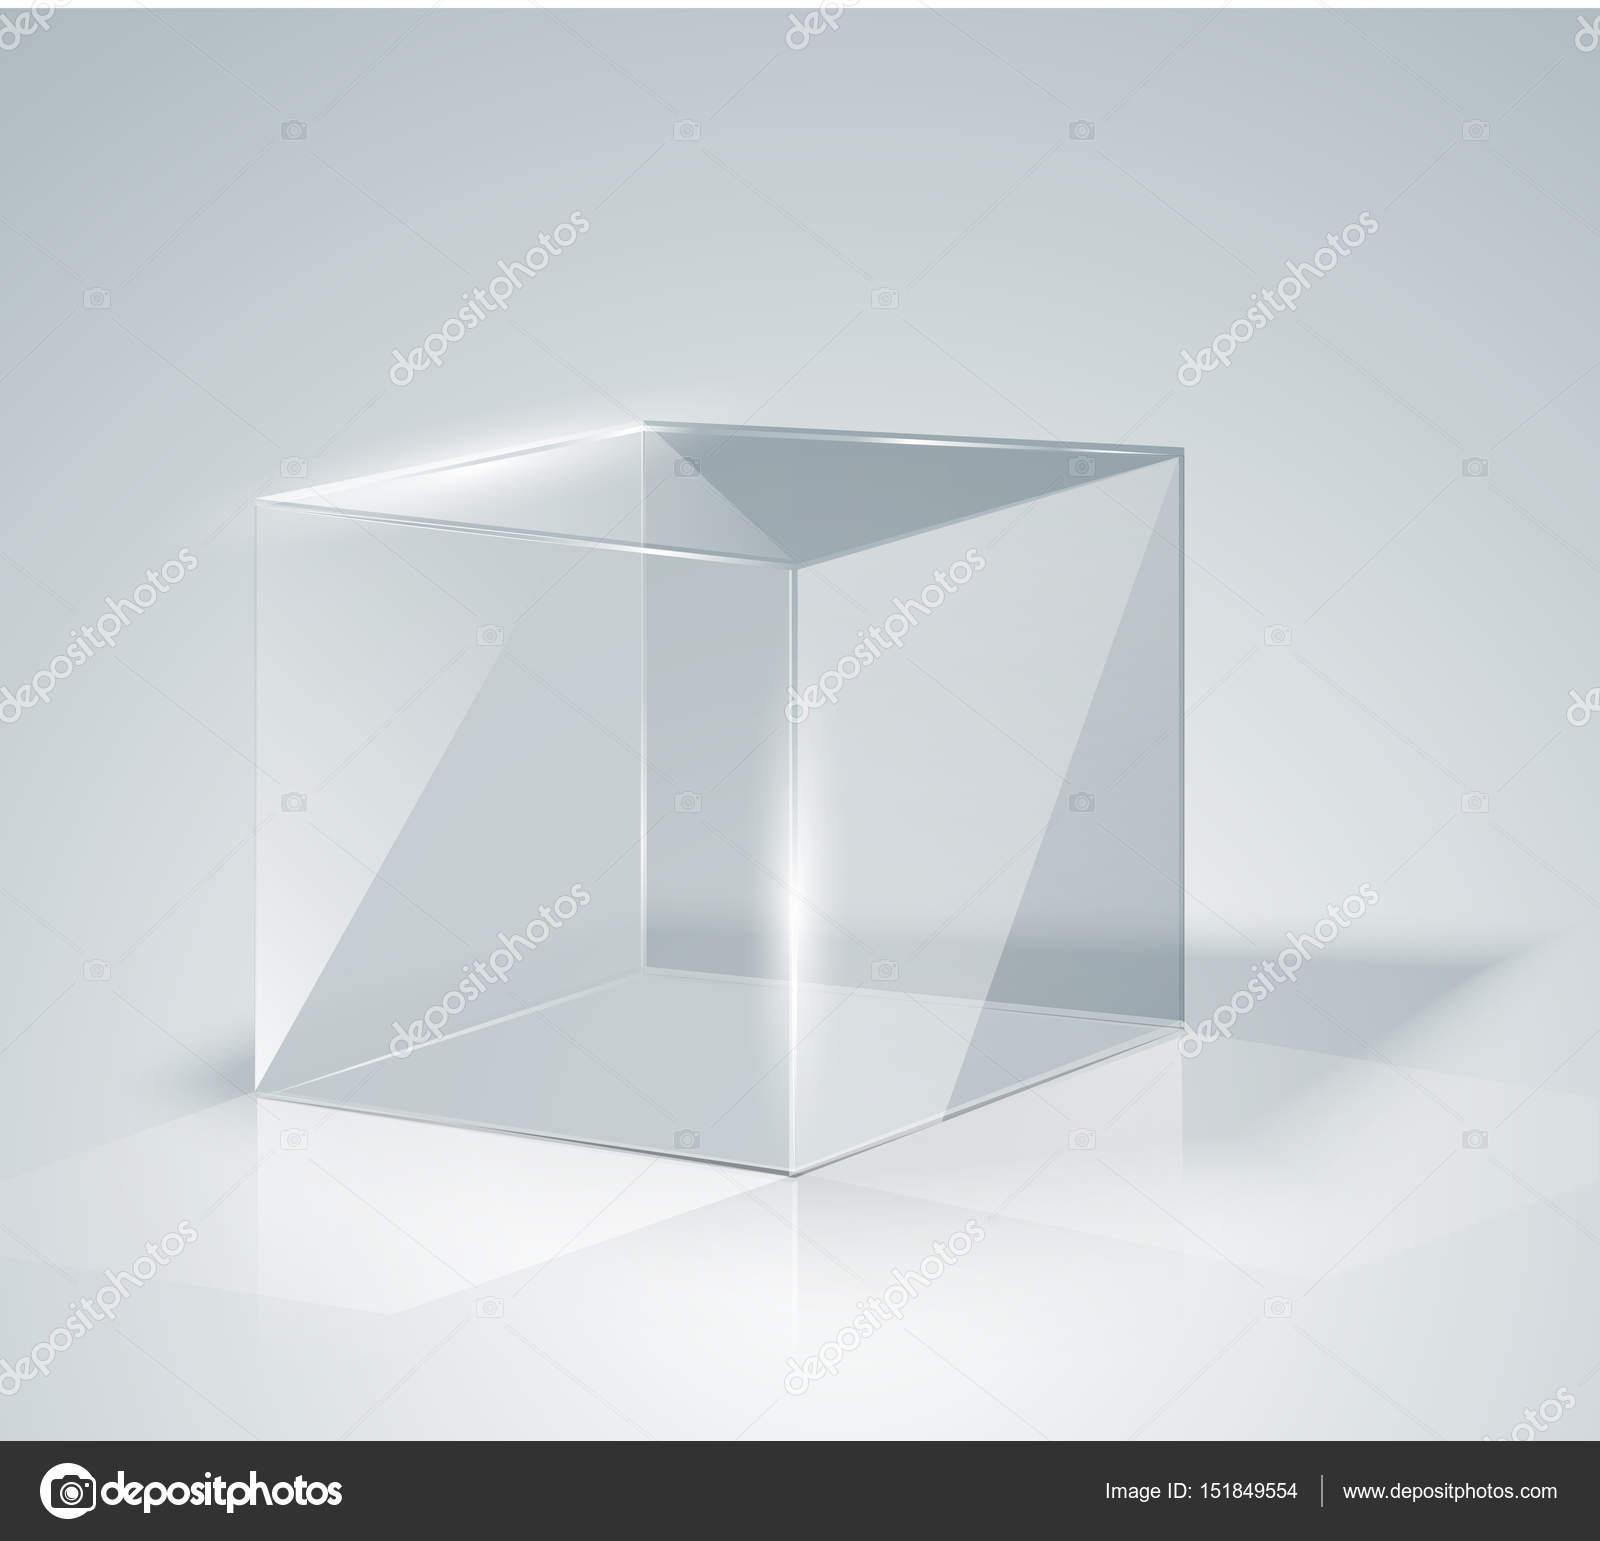 3d Glazen Kubus.Glazen Kubus Transparante Kubus Stockvector C Ann Zasimova 151849554